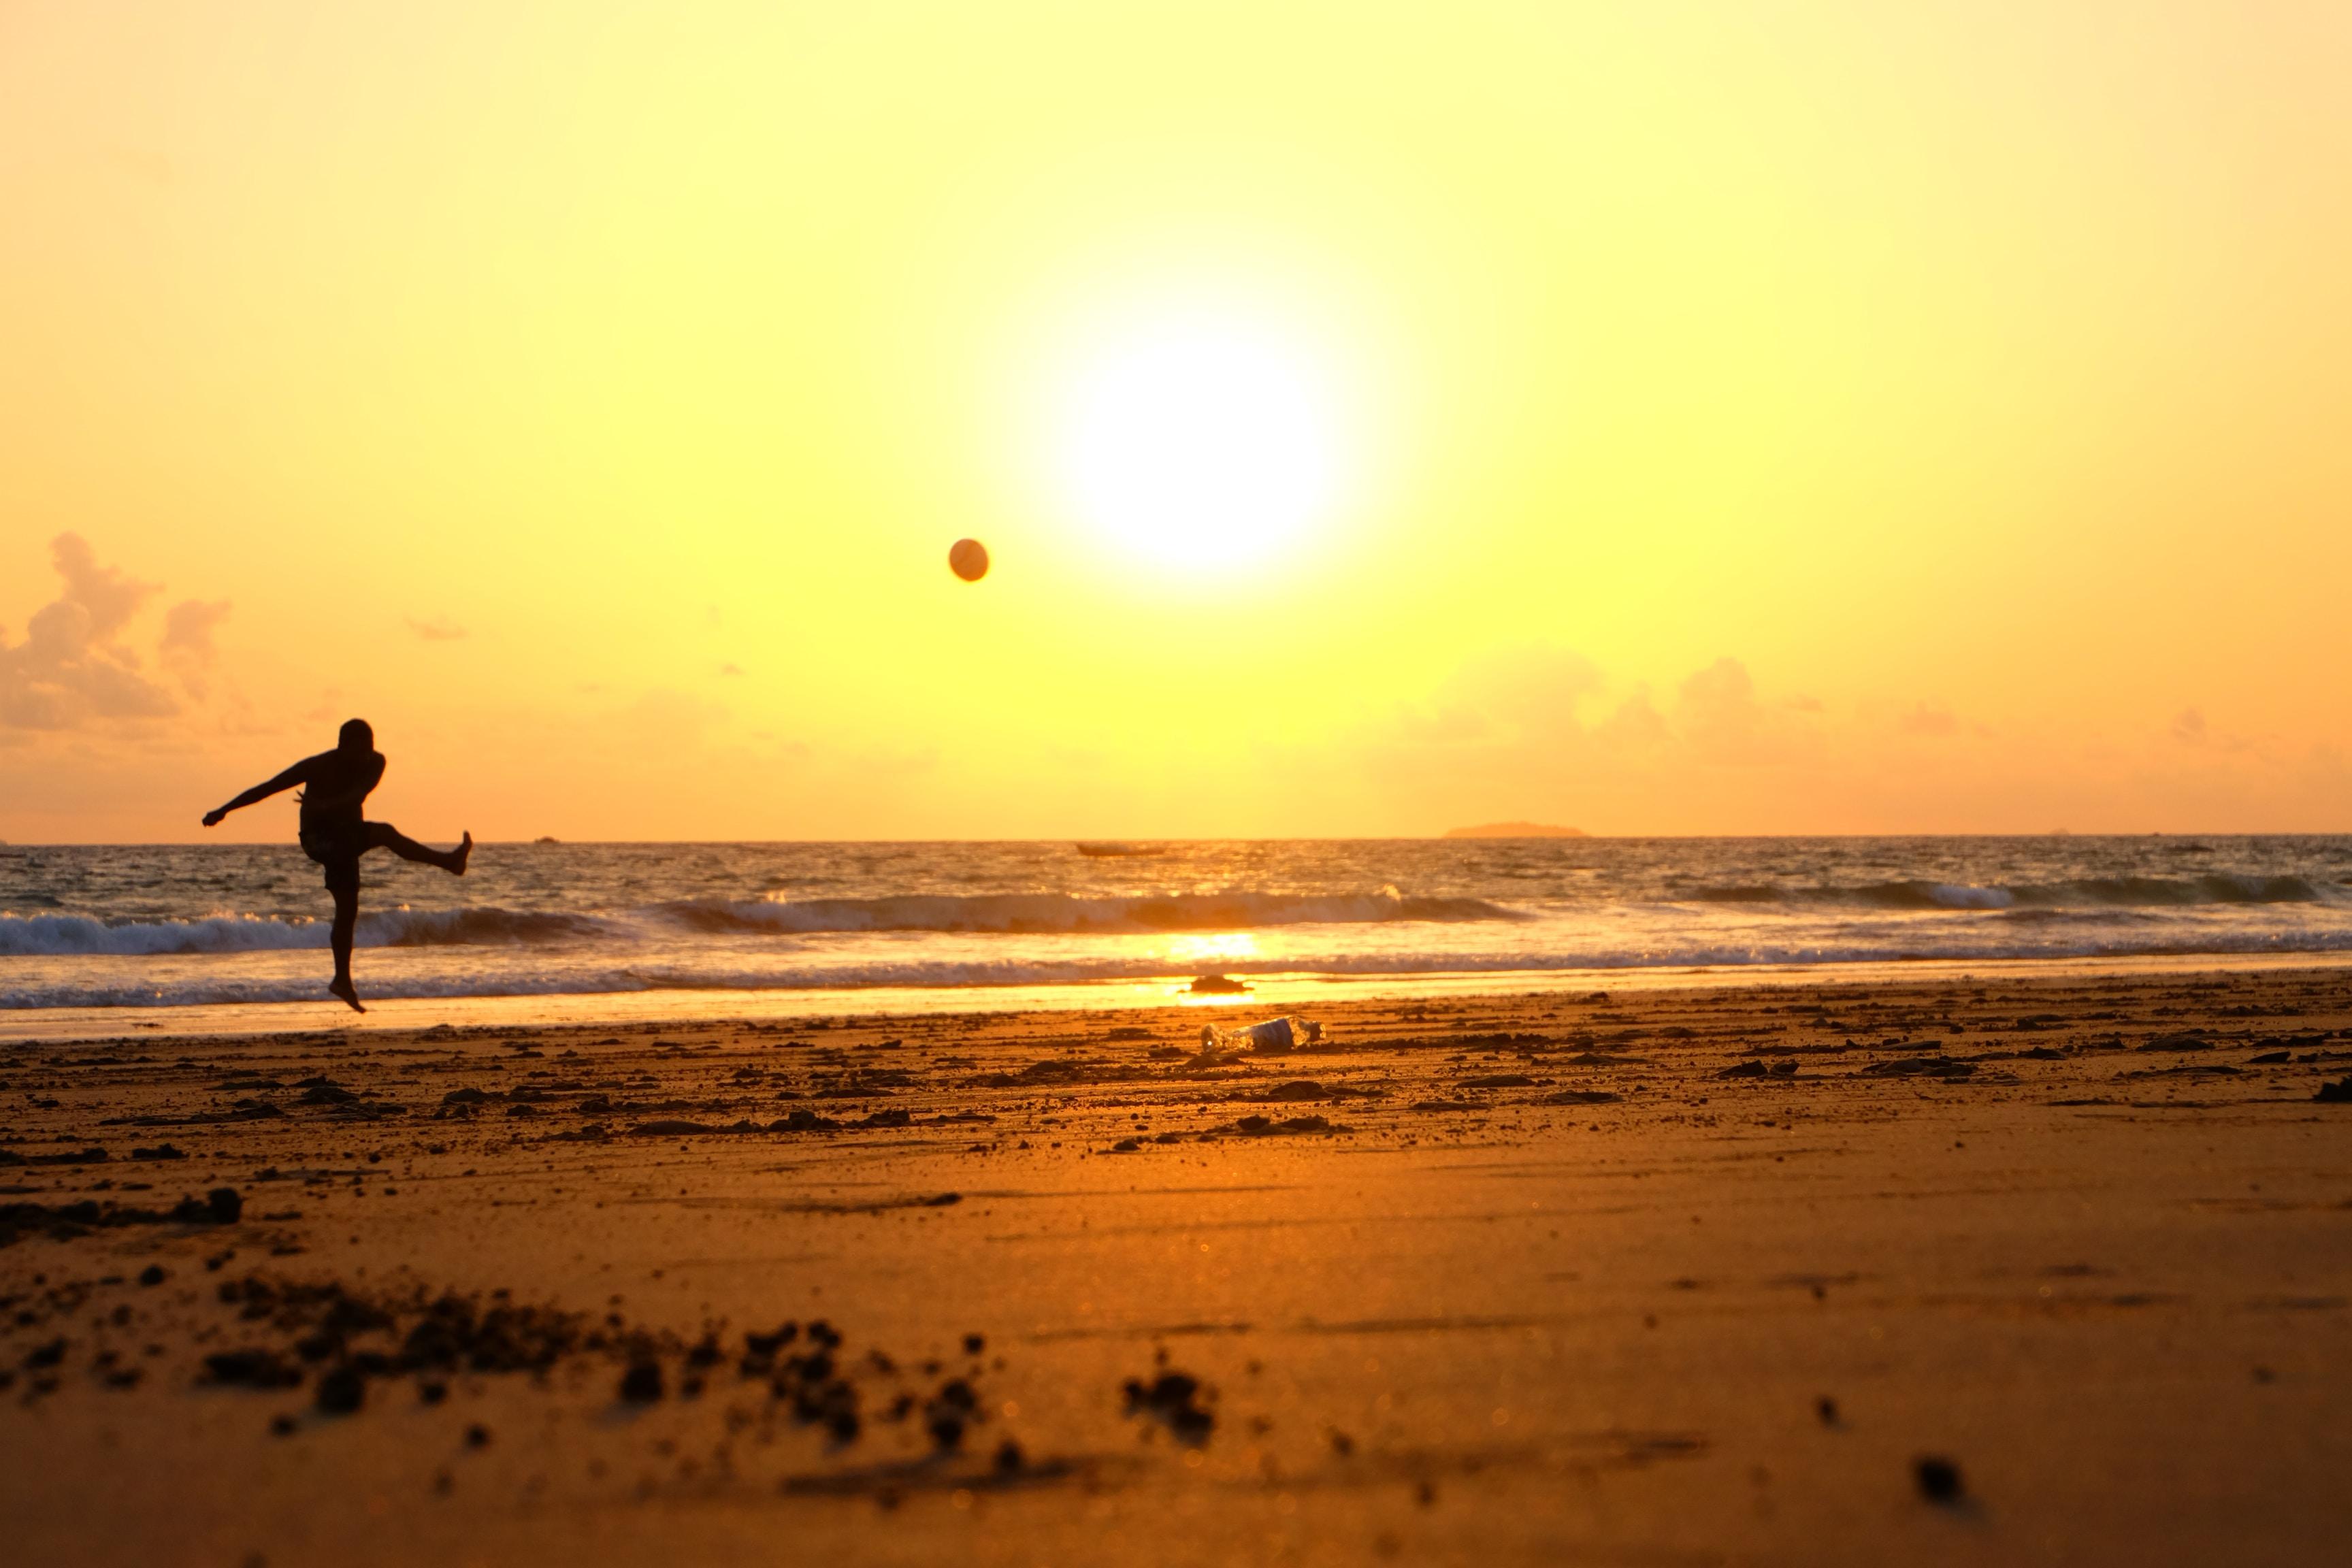 man kicking ball on seashore